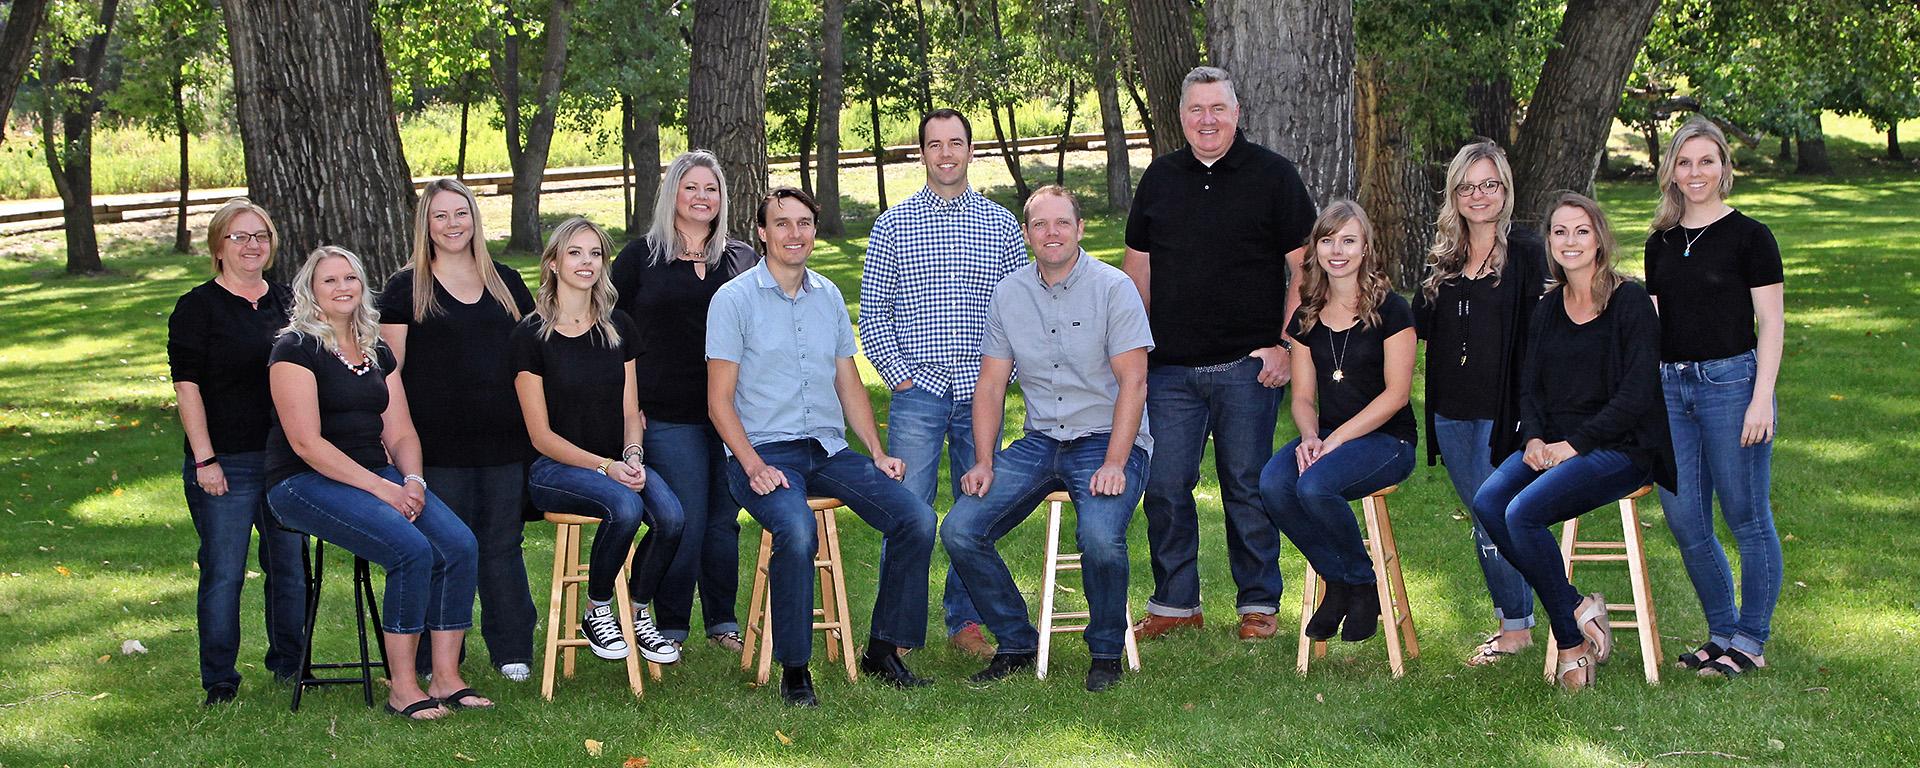 Staff at Horizon Family Dental